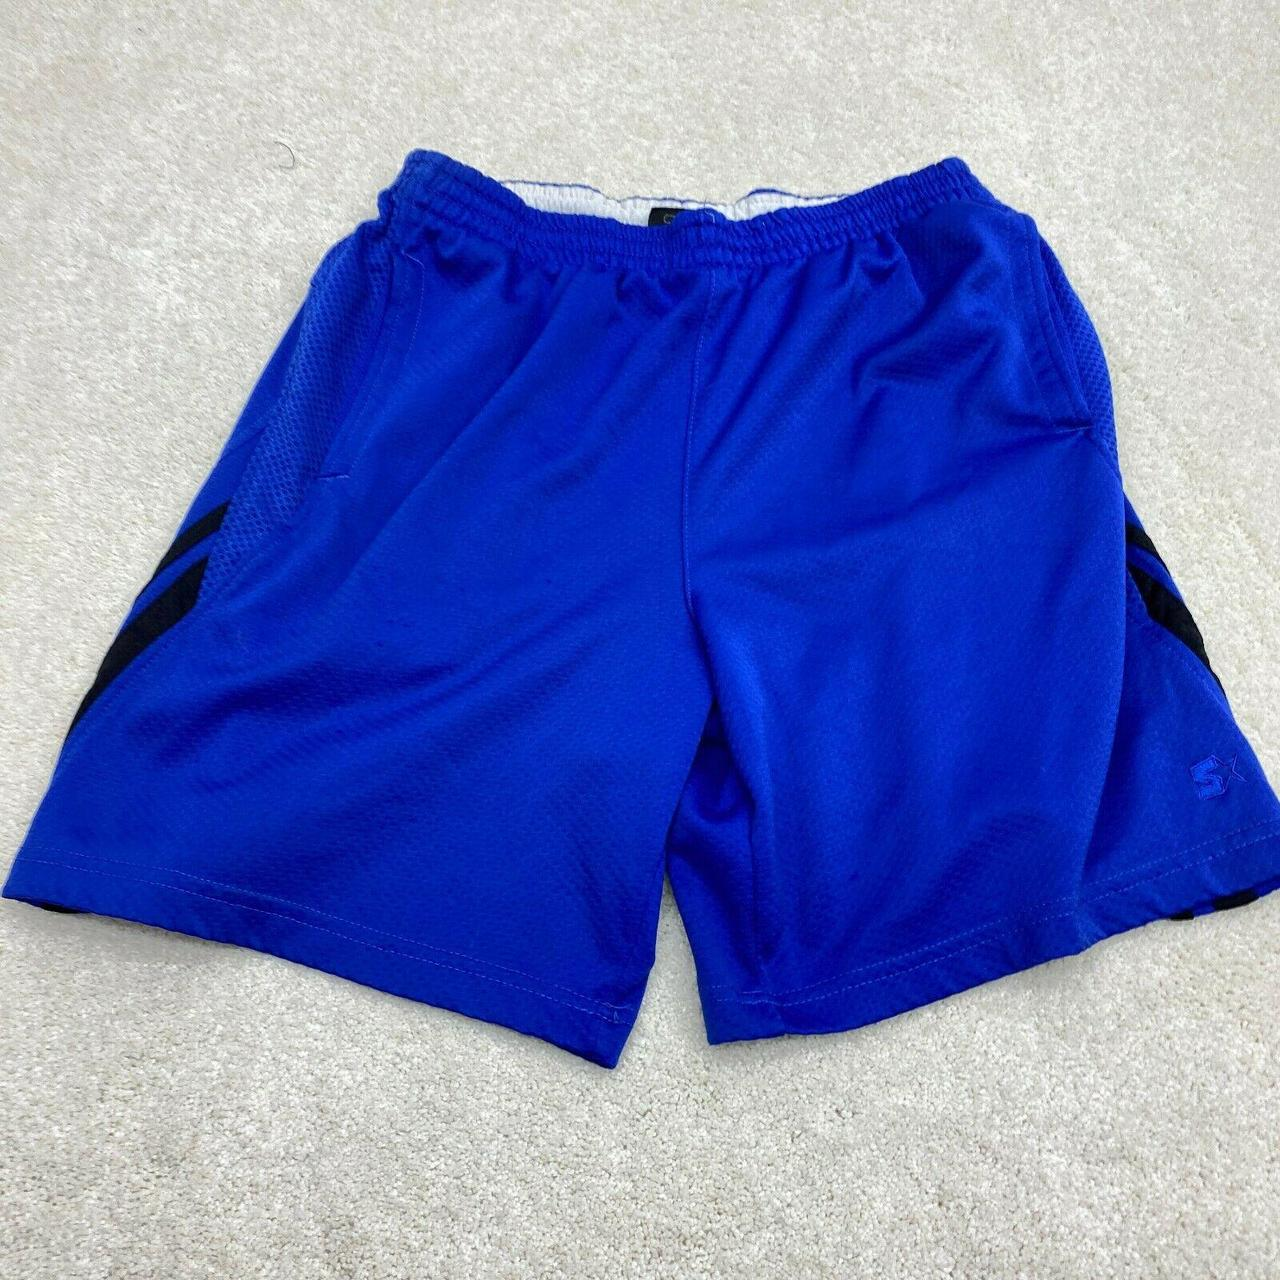 Product Image 1 - Starter Shorts Men's Medium Blue